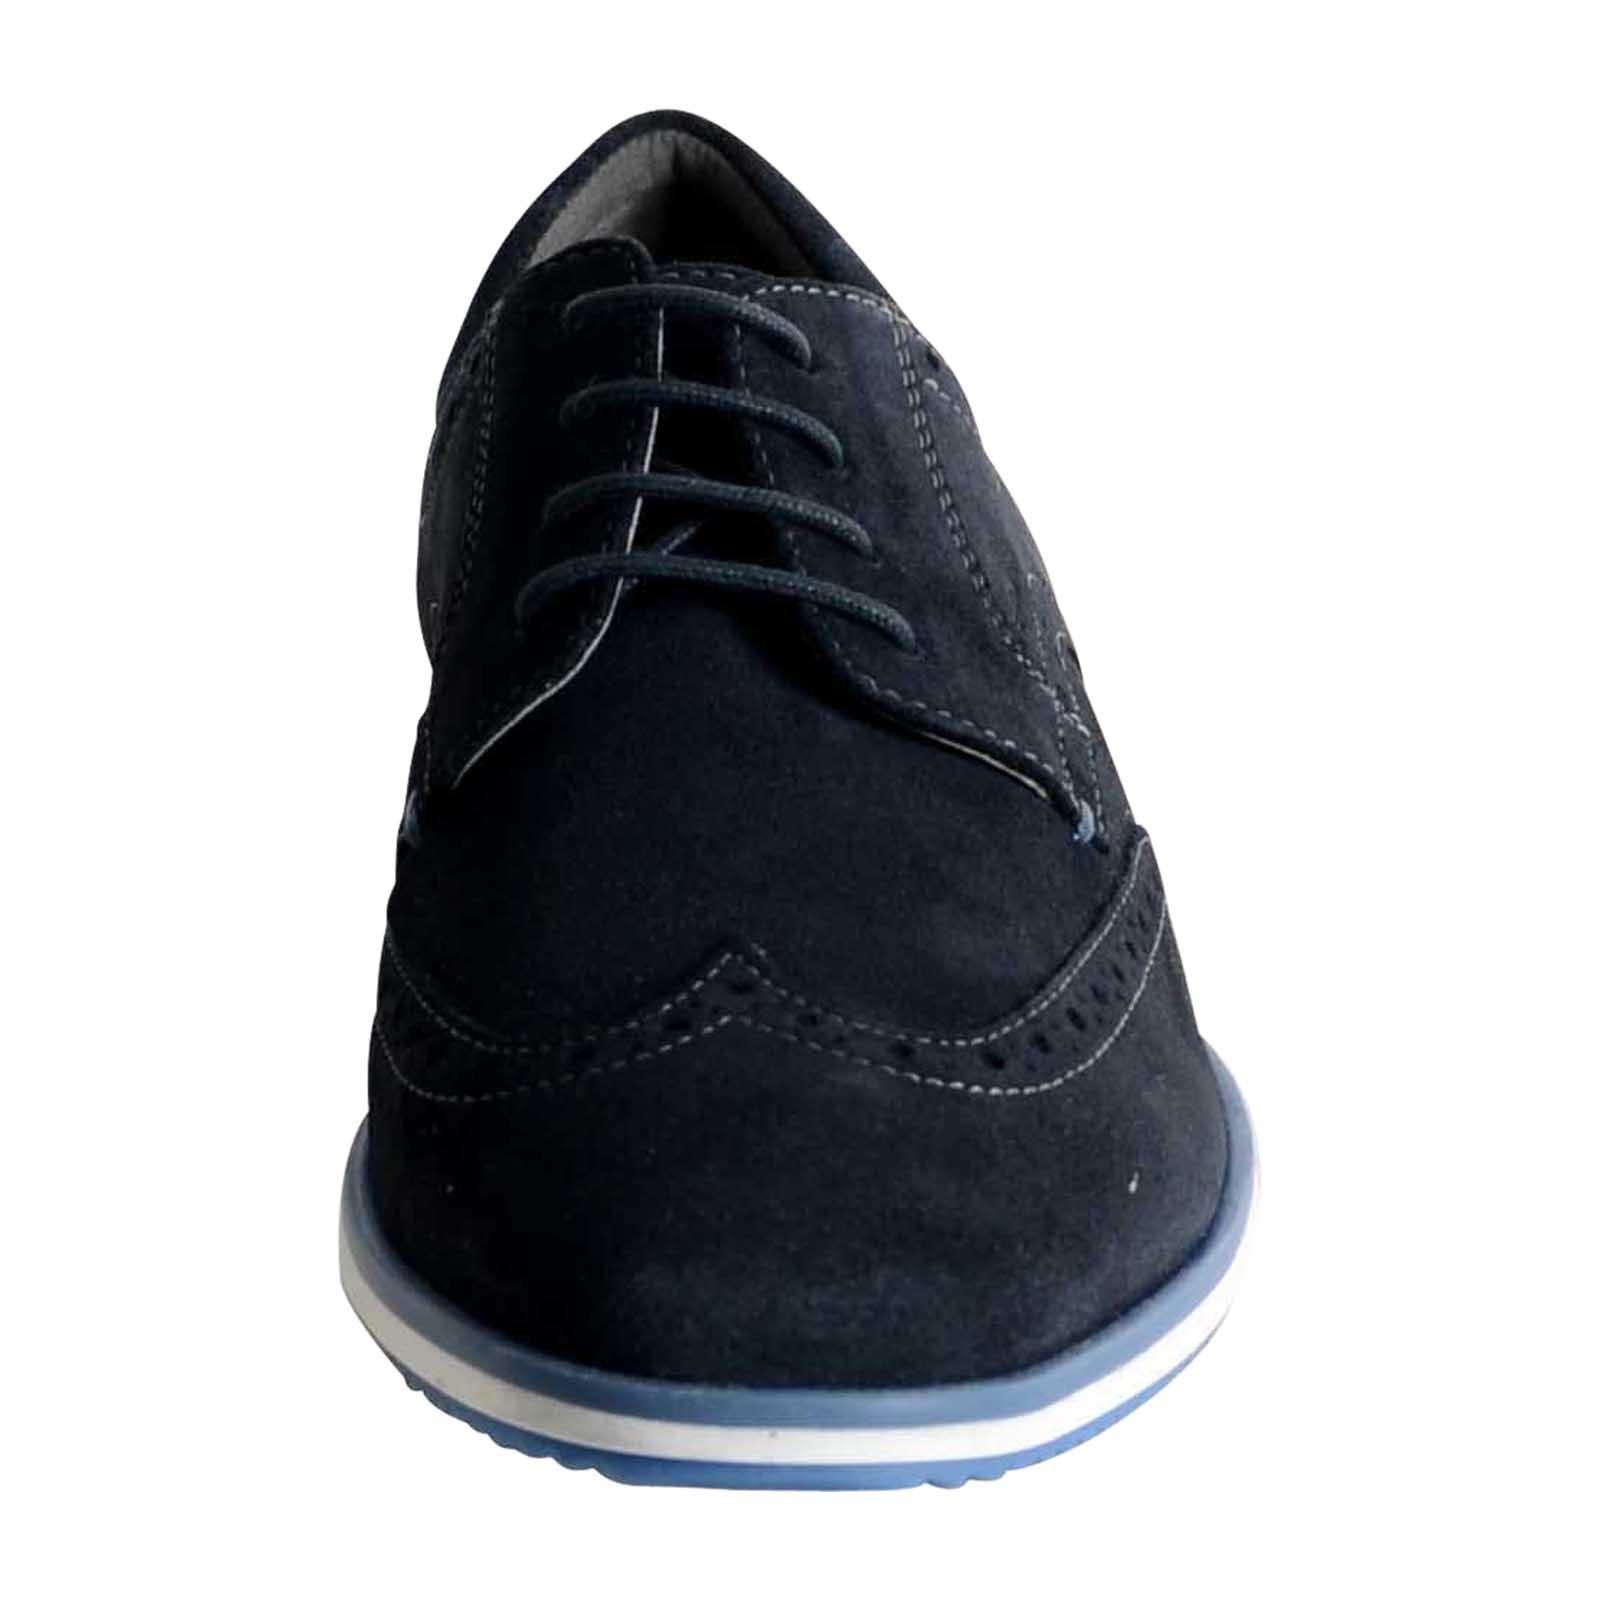 Chaussure-Geox-U-BLAINEY-A-SUEDE miniature 3